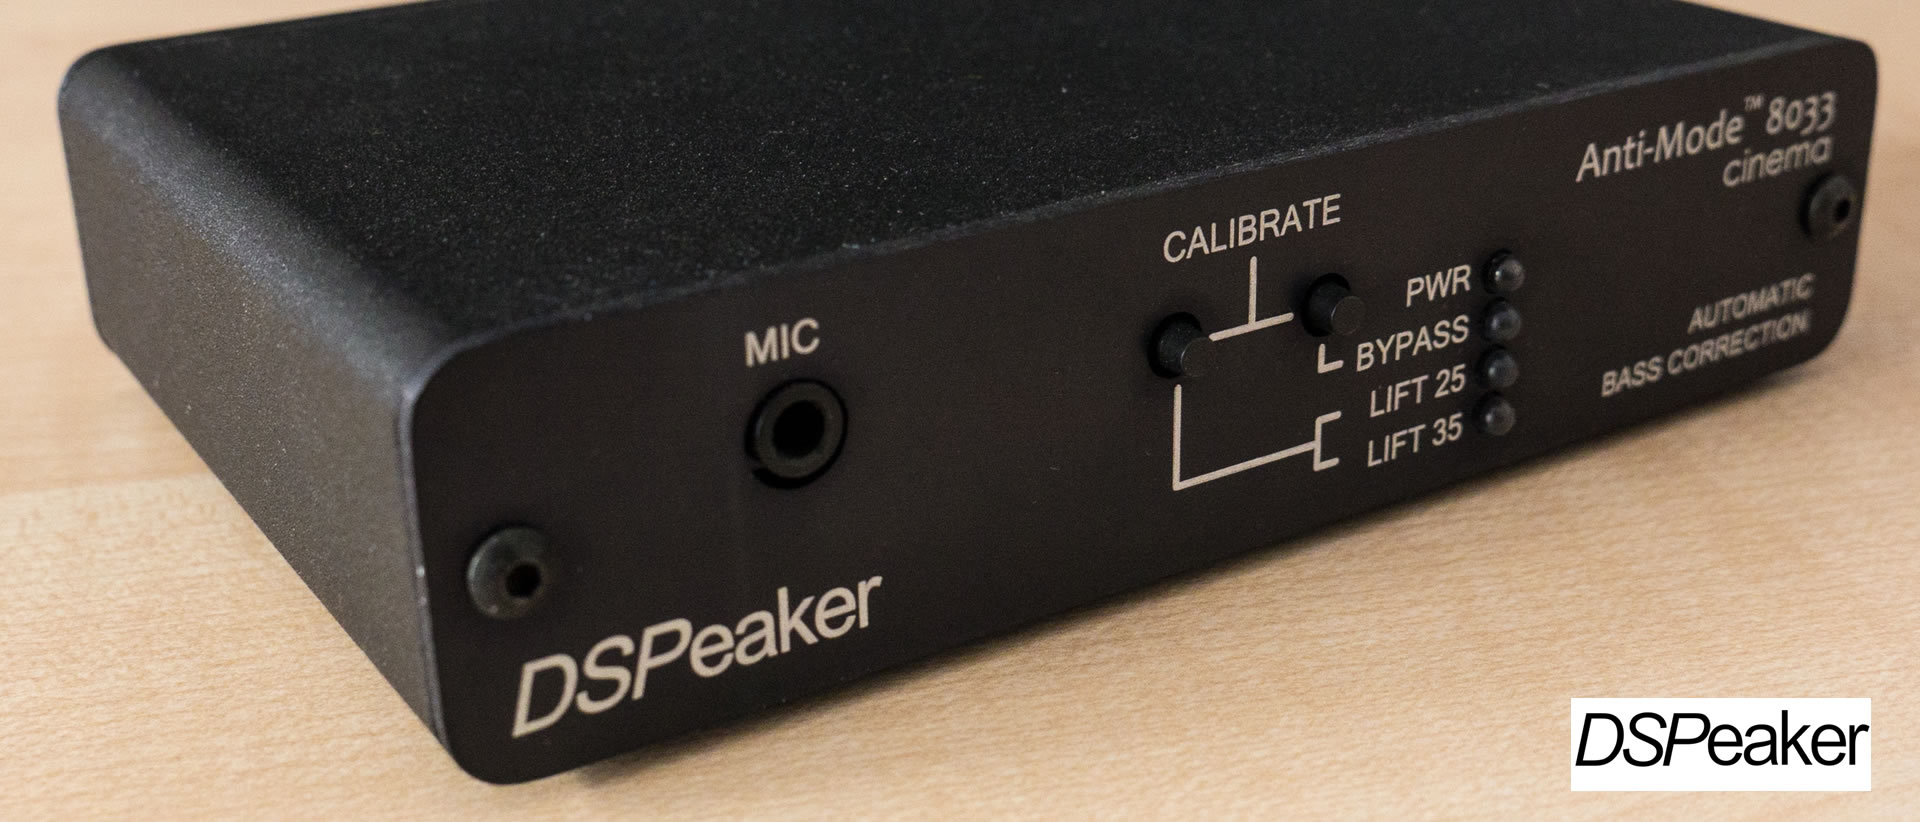 DSPeaker Hrvatska: korekcija sobne akustike